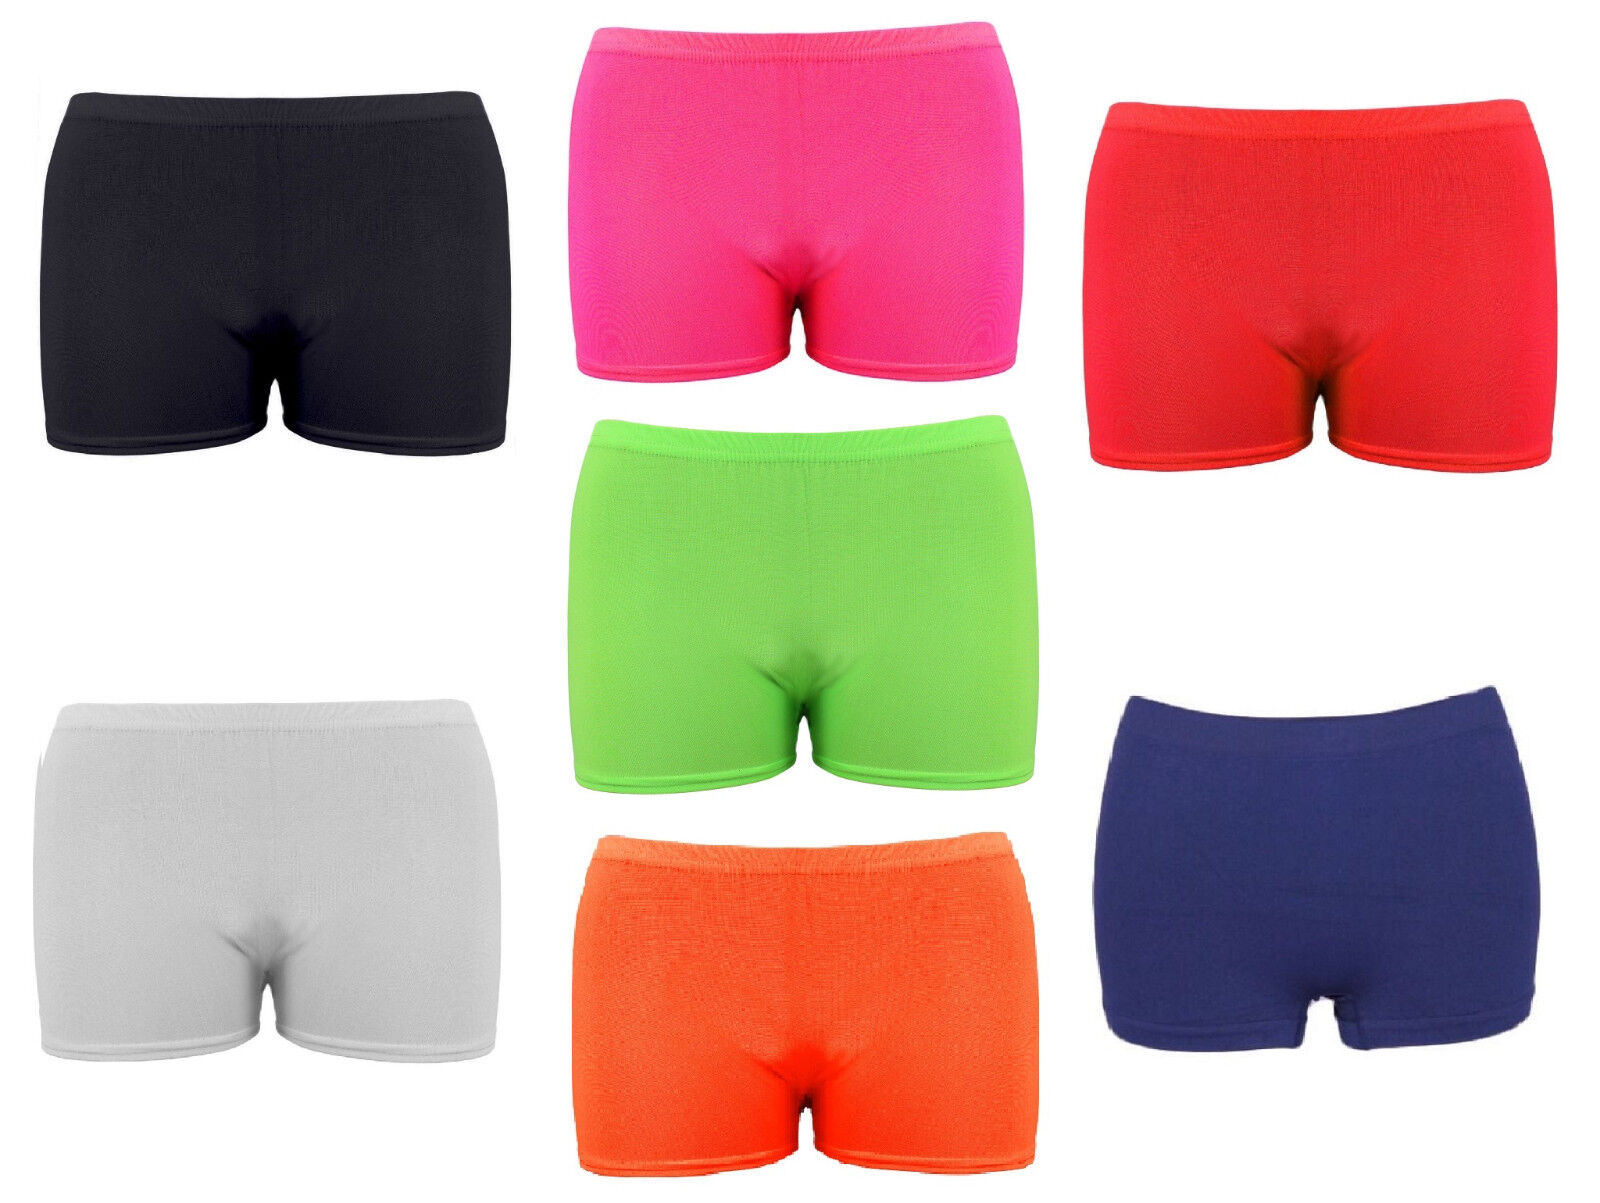 Mädchen Kinder Mikrofaser Schule Hotpants Shorts Tanz Gym Stretch Lycra Alter